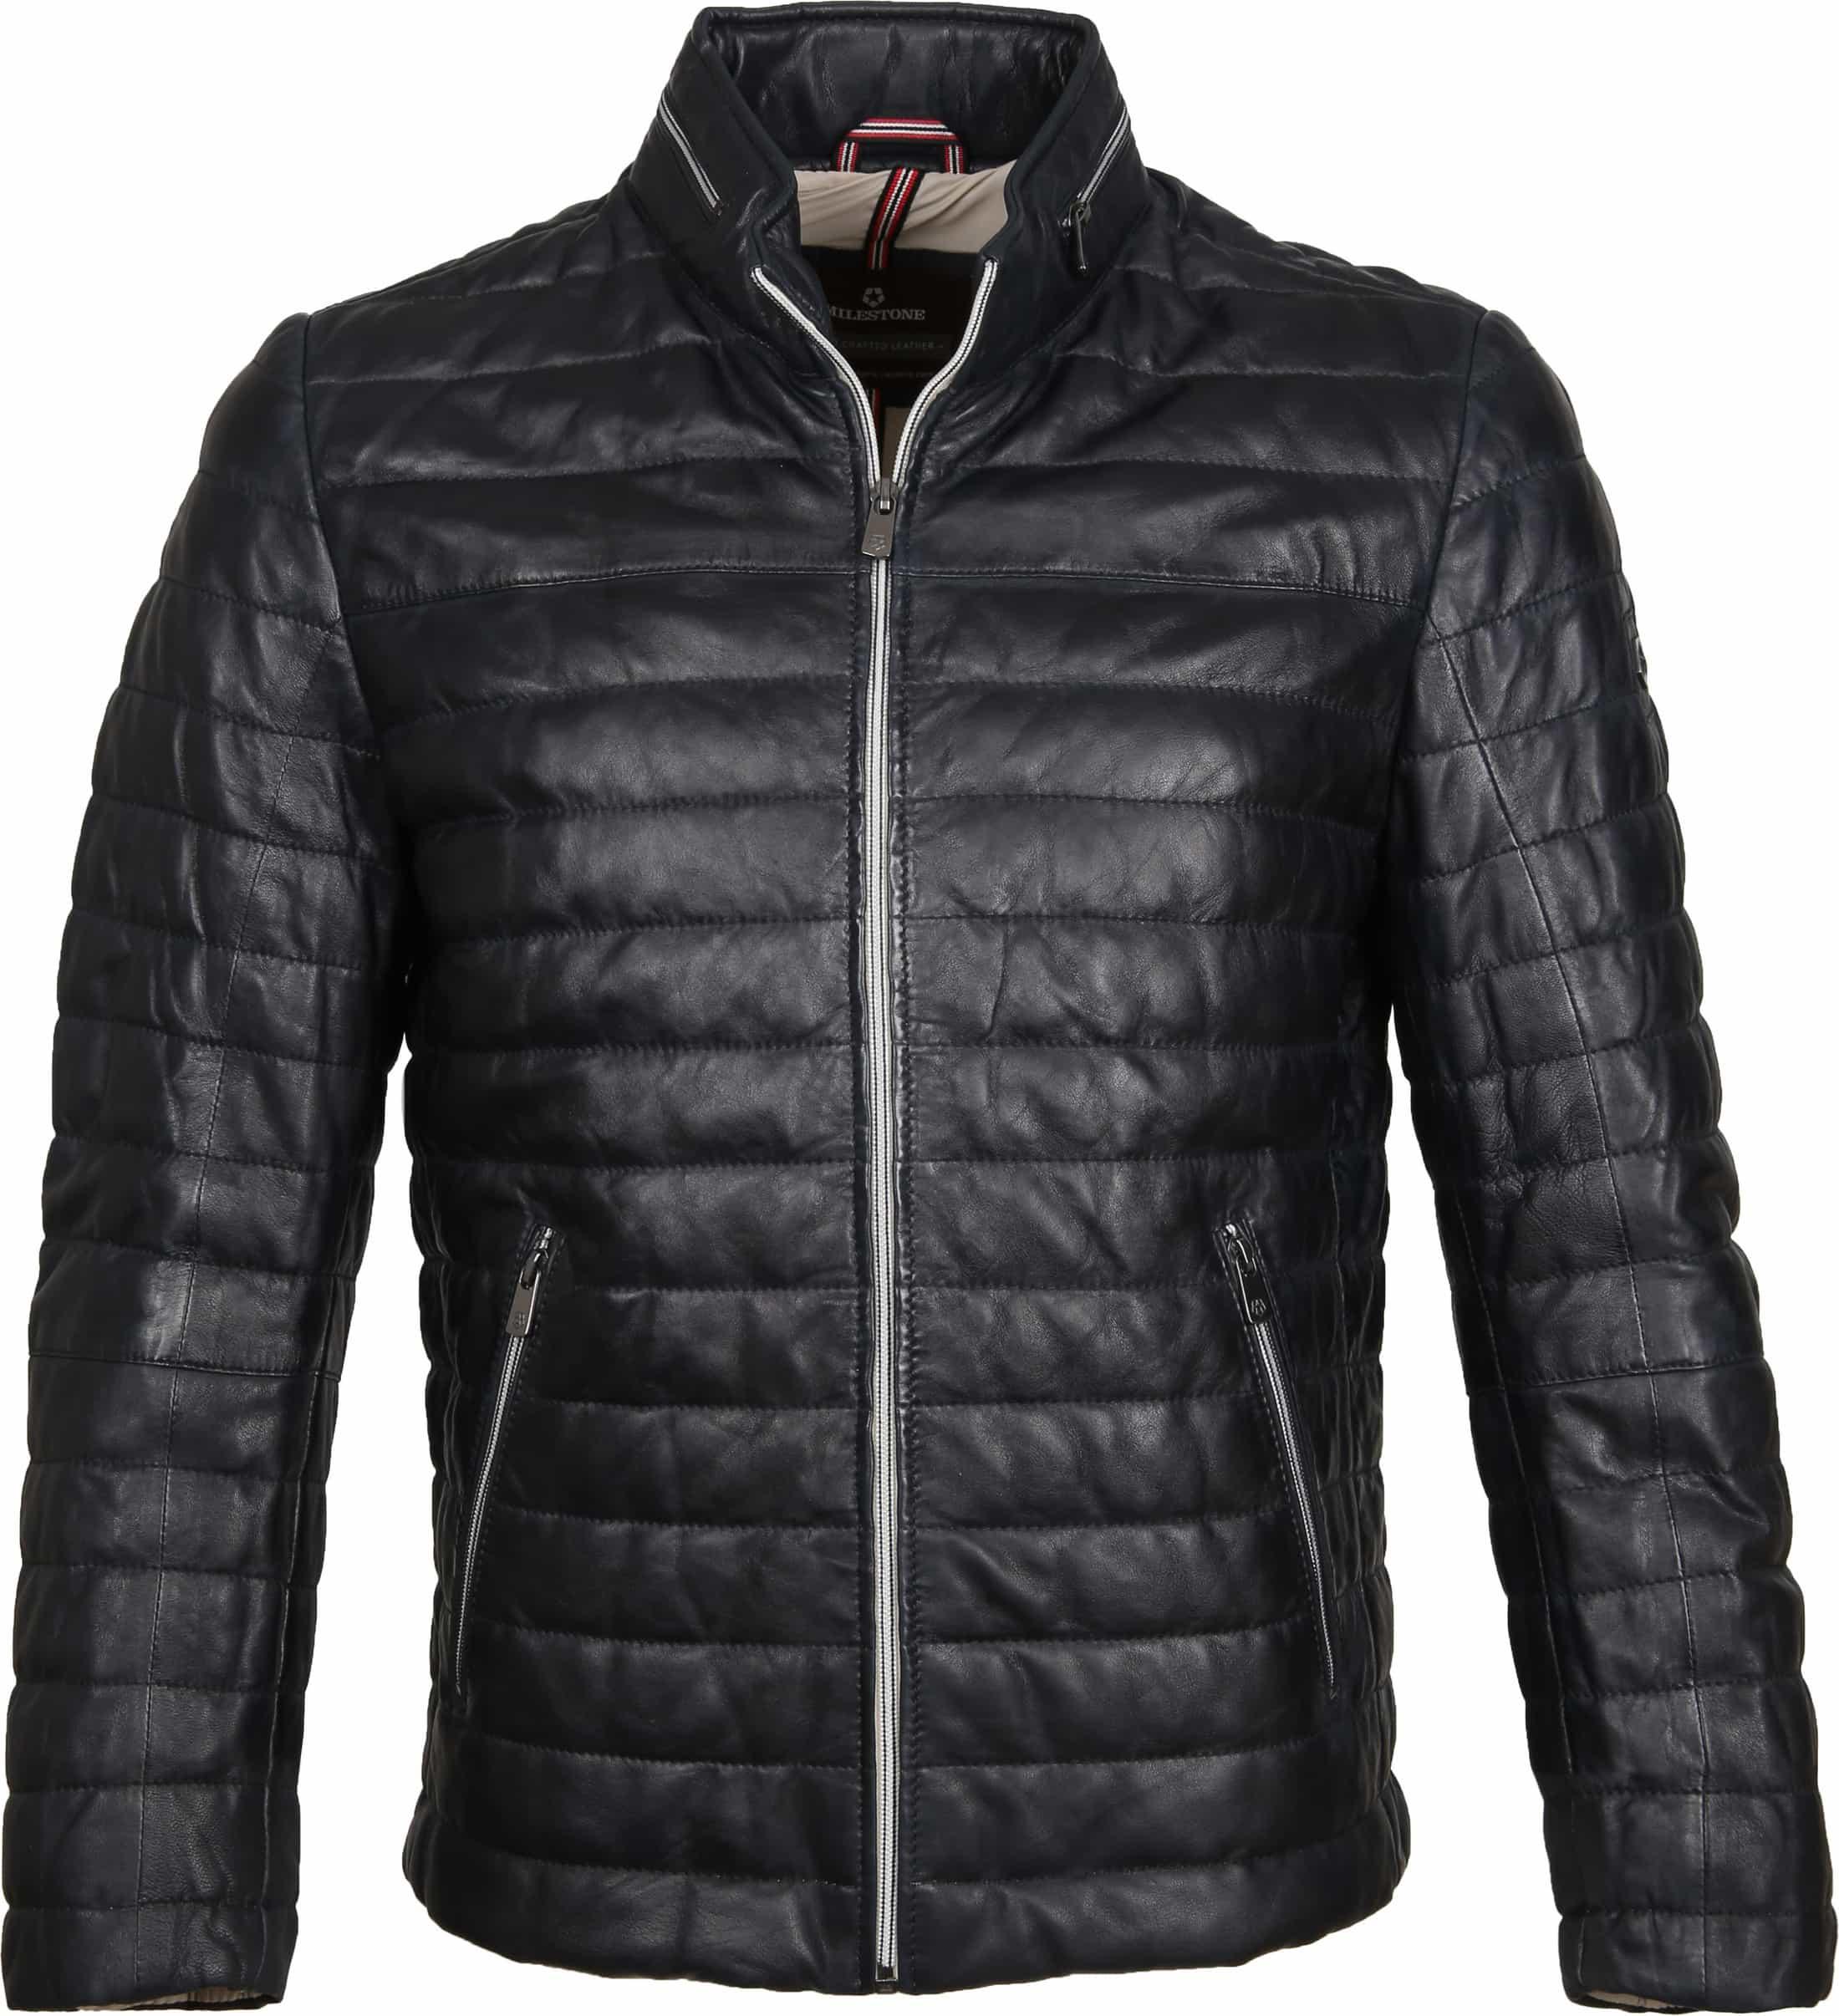 Milestone Tereno Leather Jacket Navy Grey foto 0